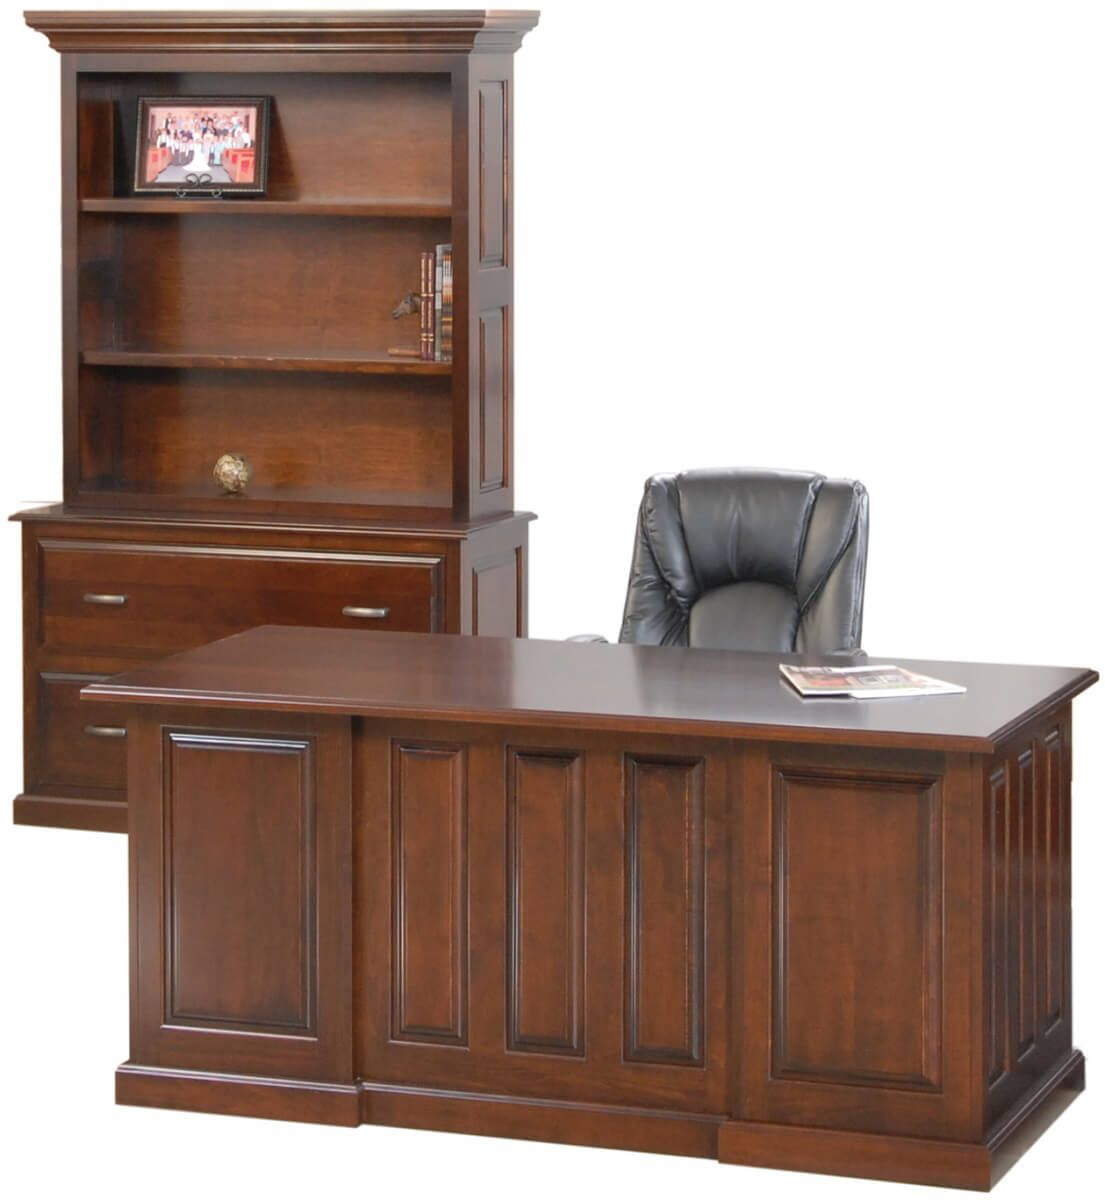 Bookcase and Wallace Executive Desk